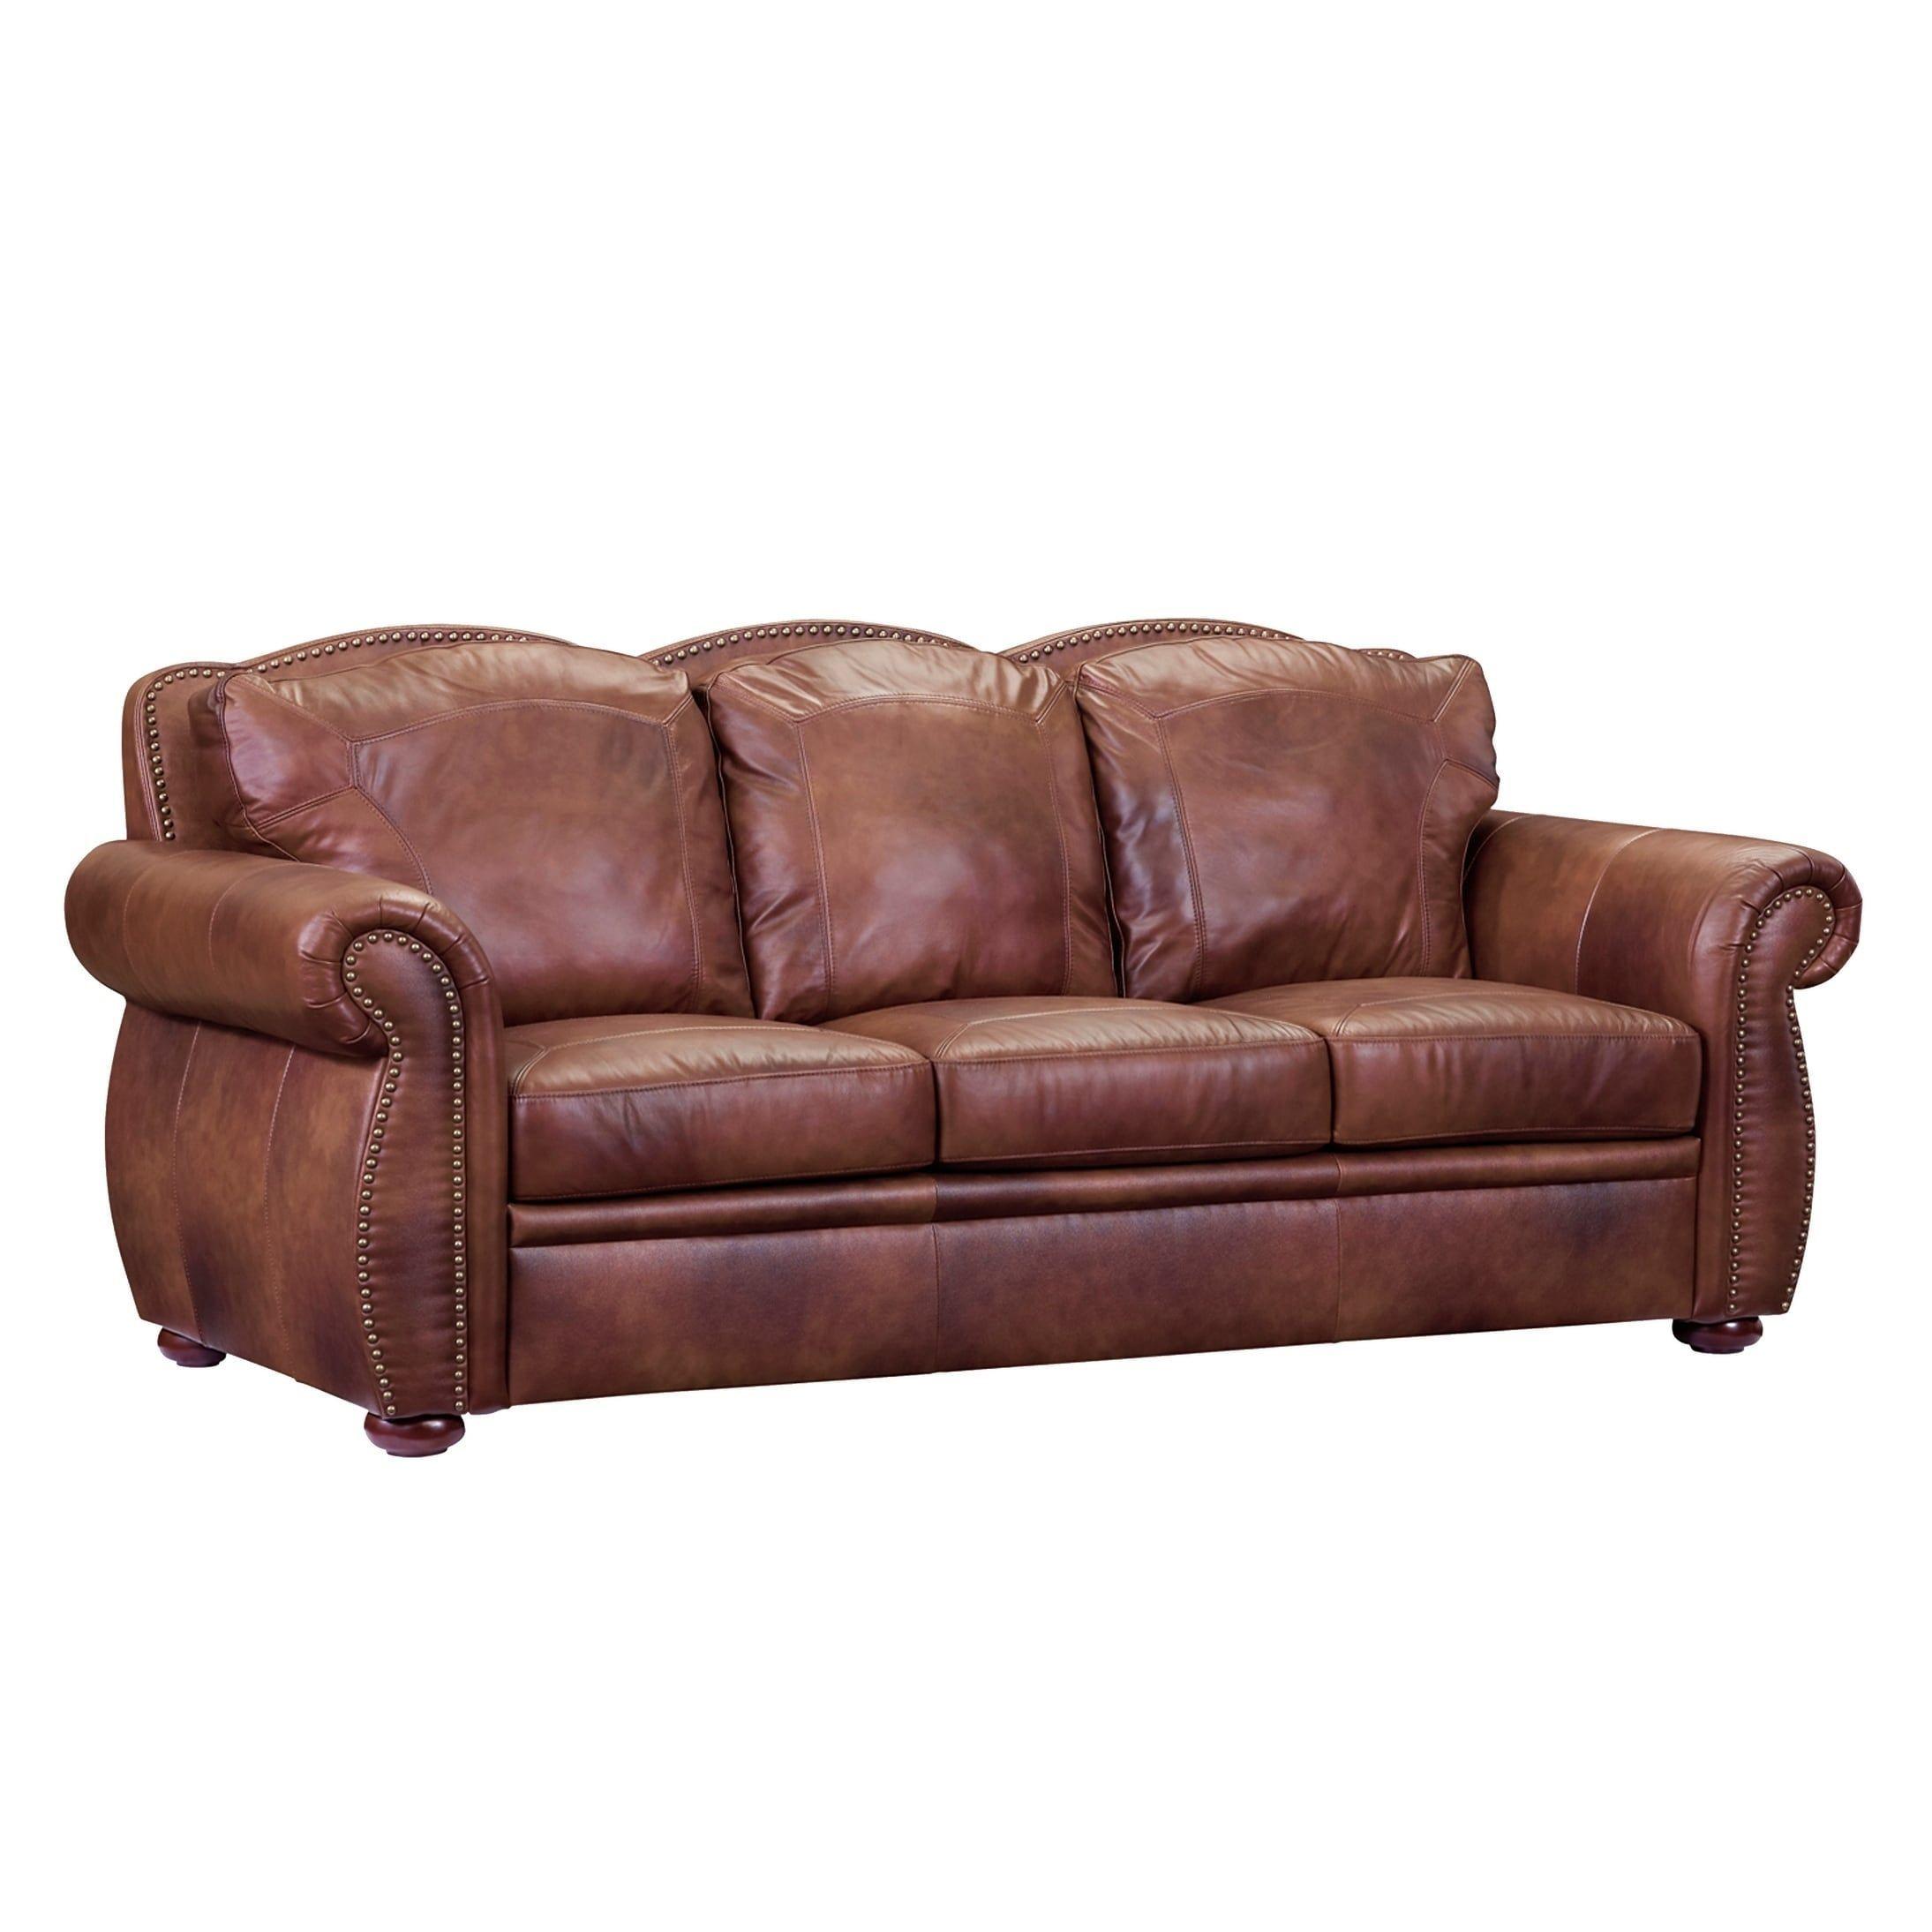 Oliver Pierce Casey Top Grain Italian Leather Sofa Brown